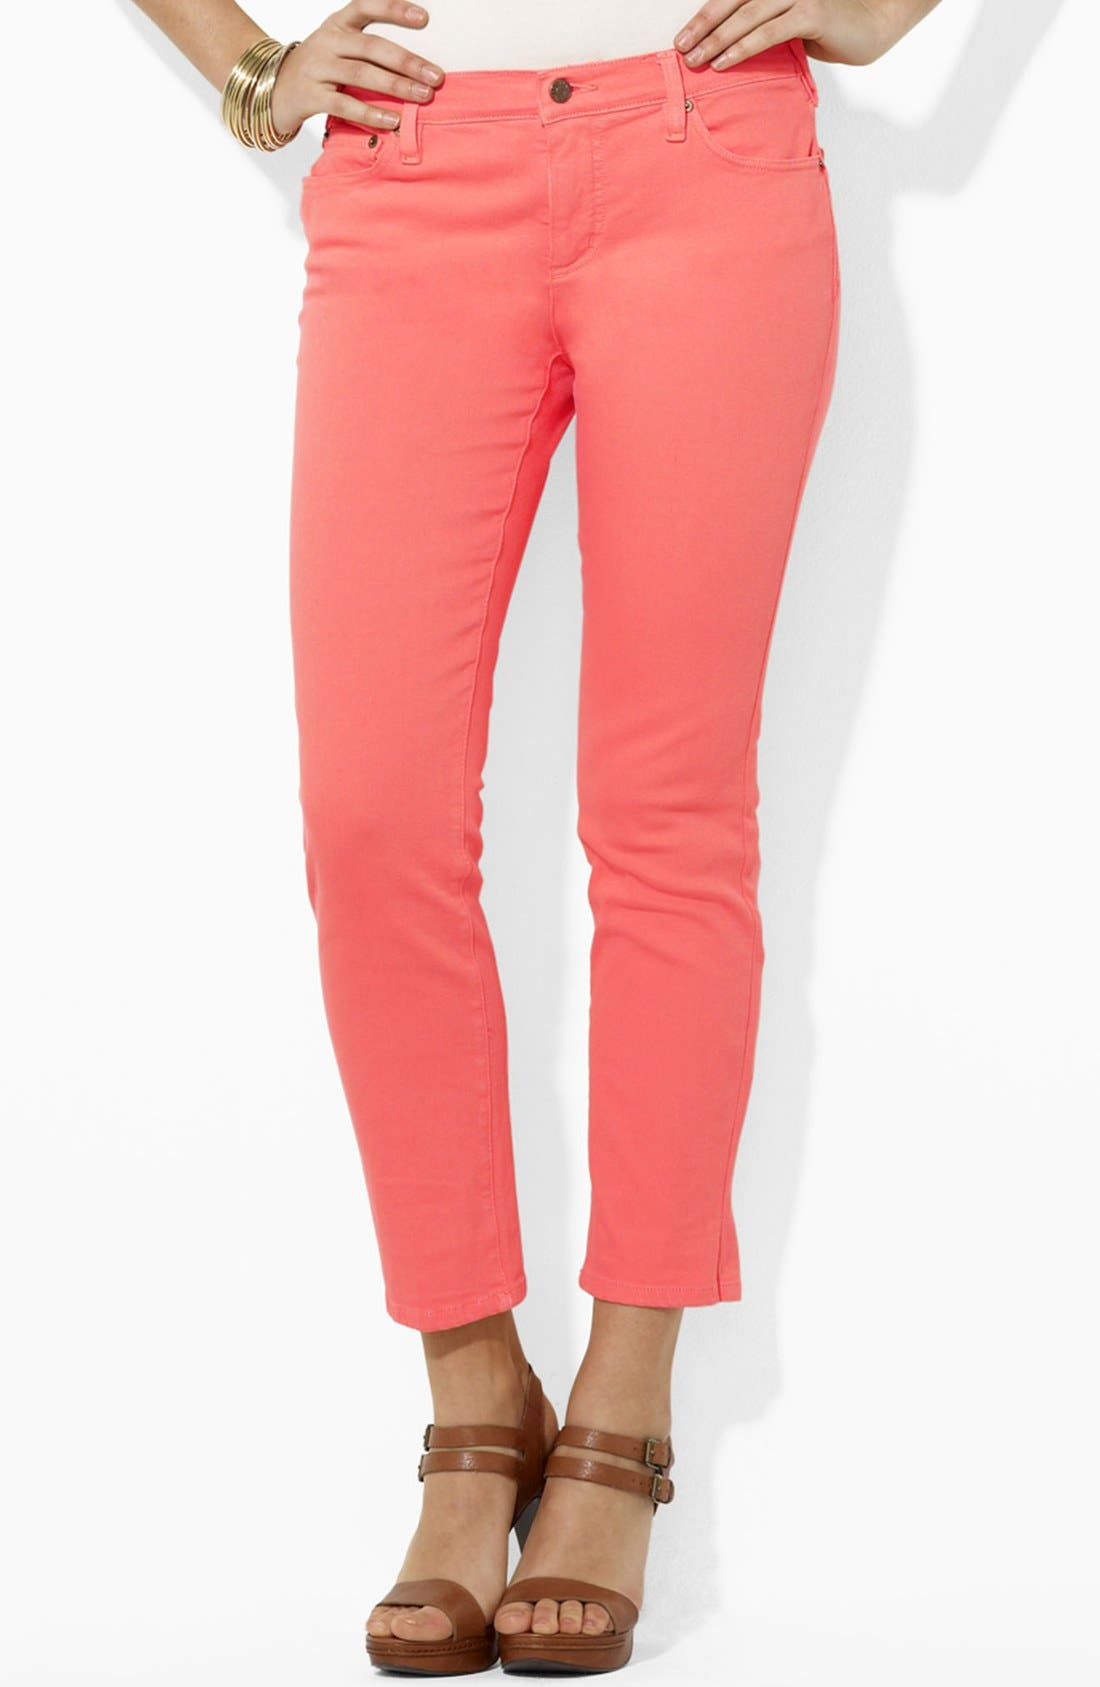 Main Image - Lauren Ralph Lauren Slimming Straight Leg Ankle Pants (Petite) (Online Only)